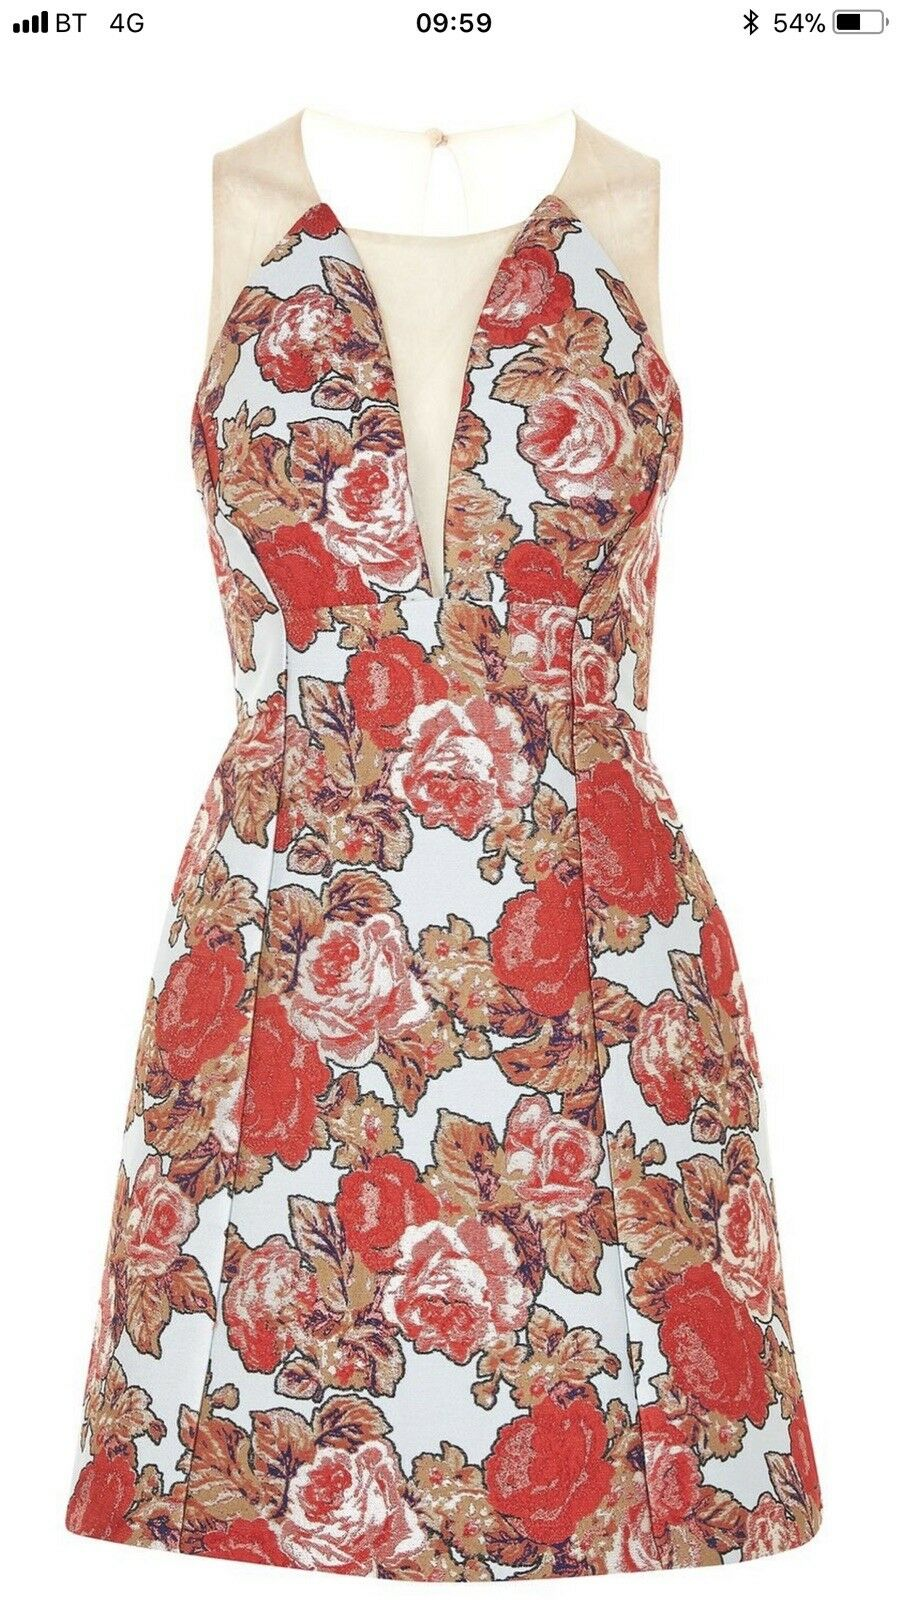 1e243f0b9016 Sold Out Topshop Jacquard Sheer Panel Dress UK Size 12 BNWT Prom Floral  ninaek21178-Dresses